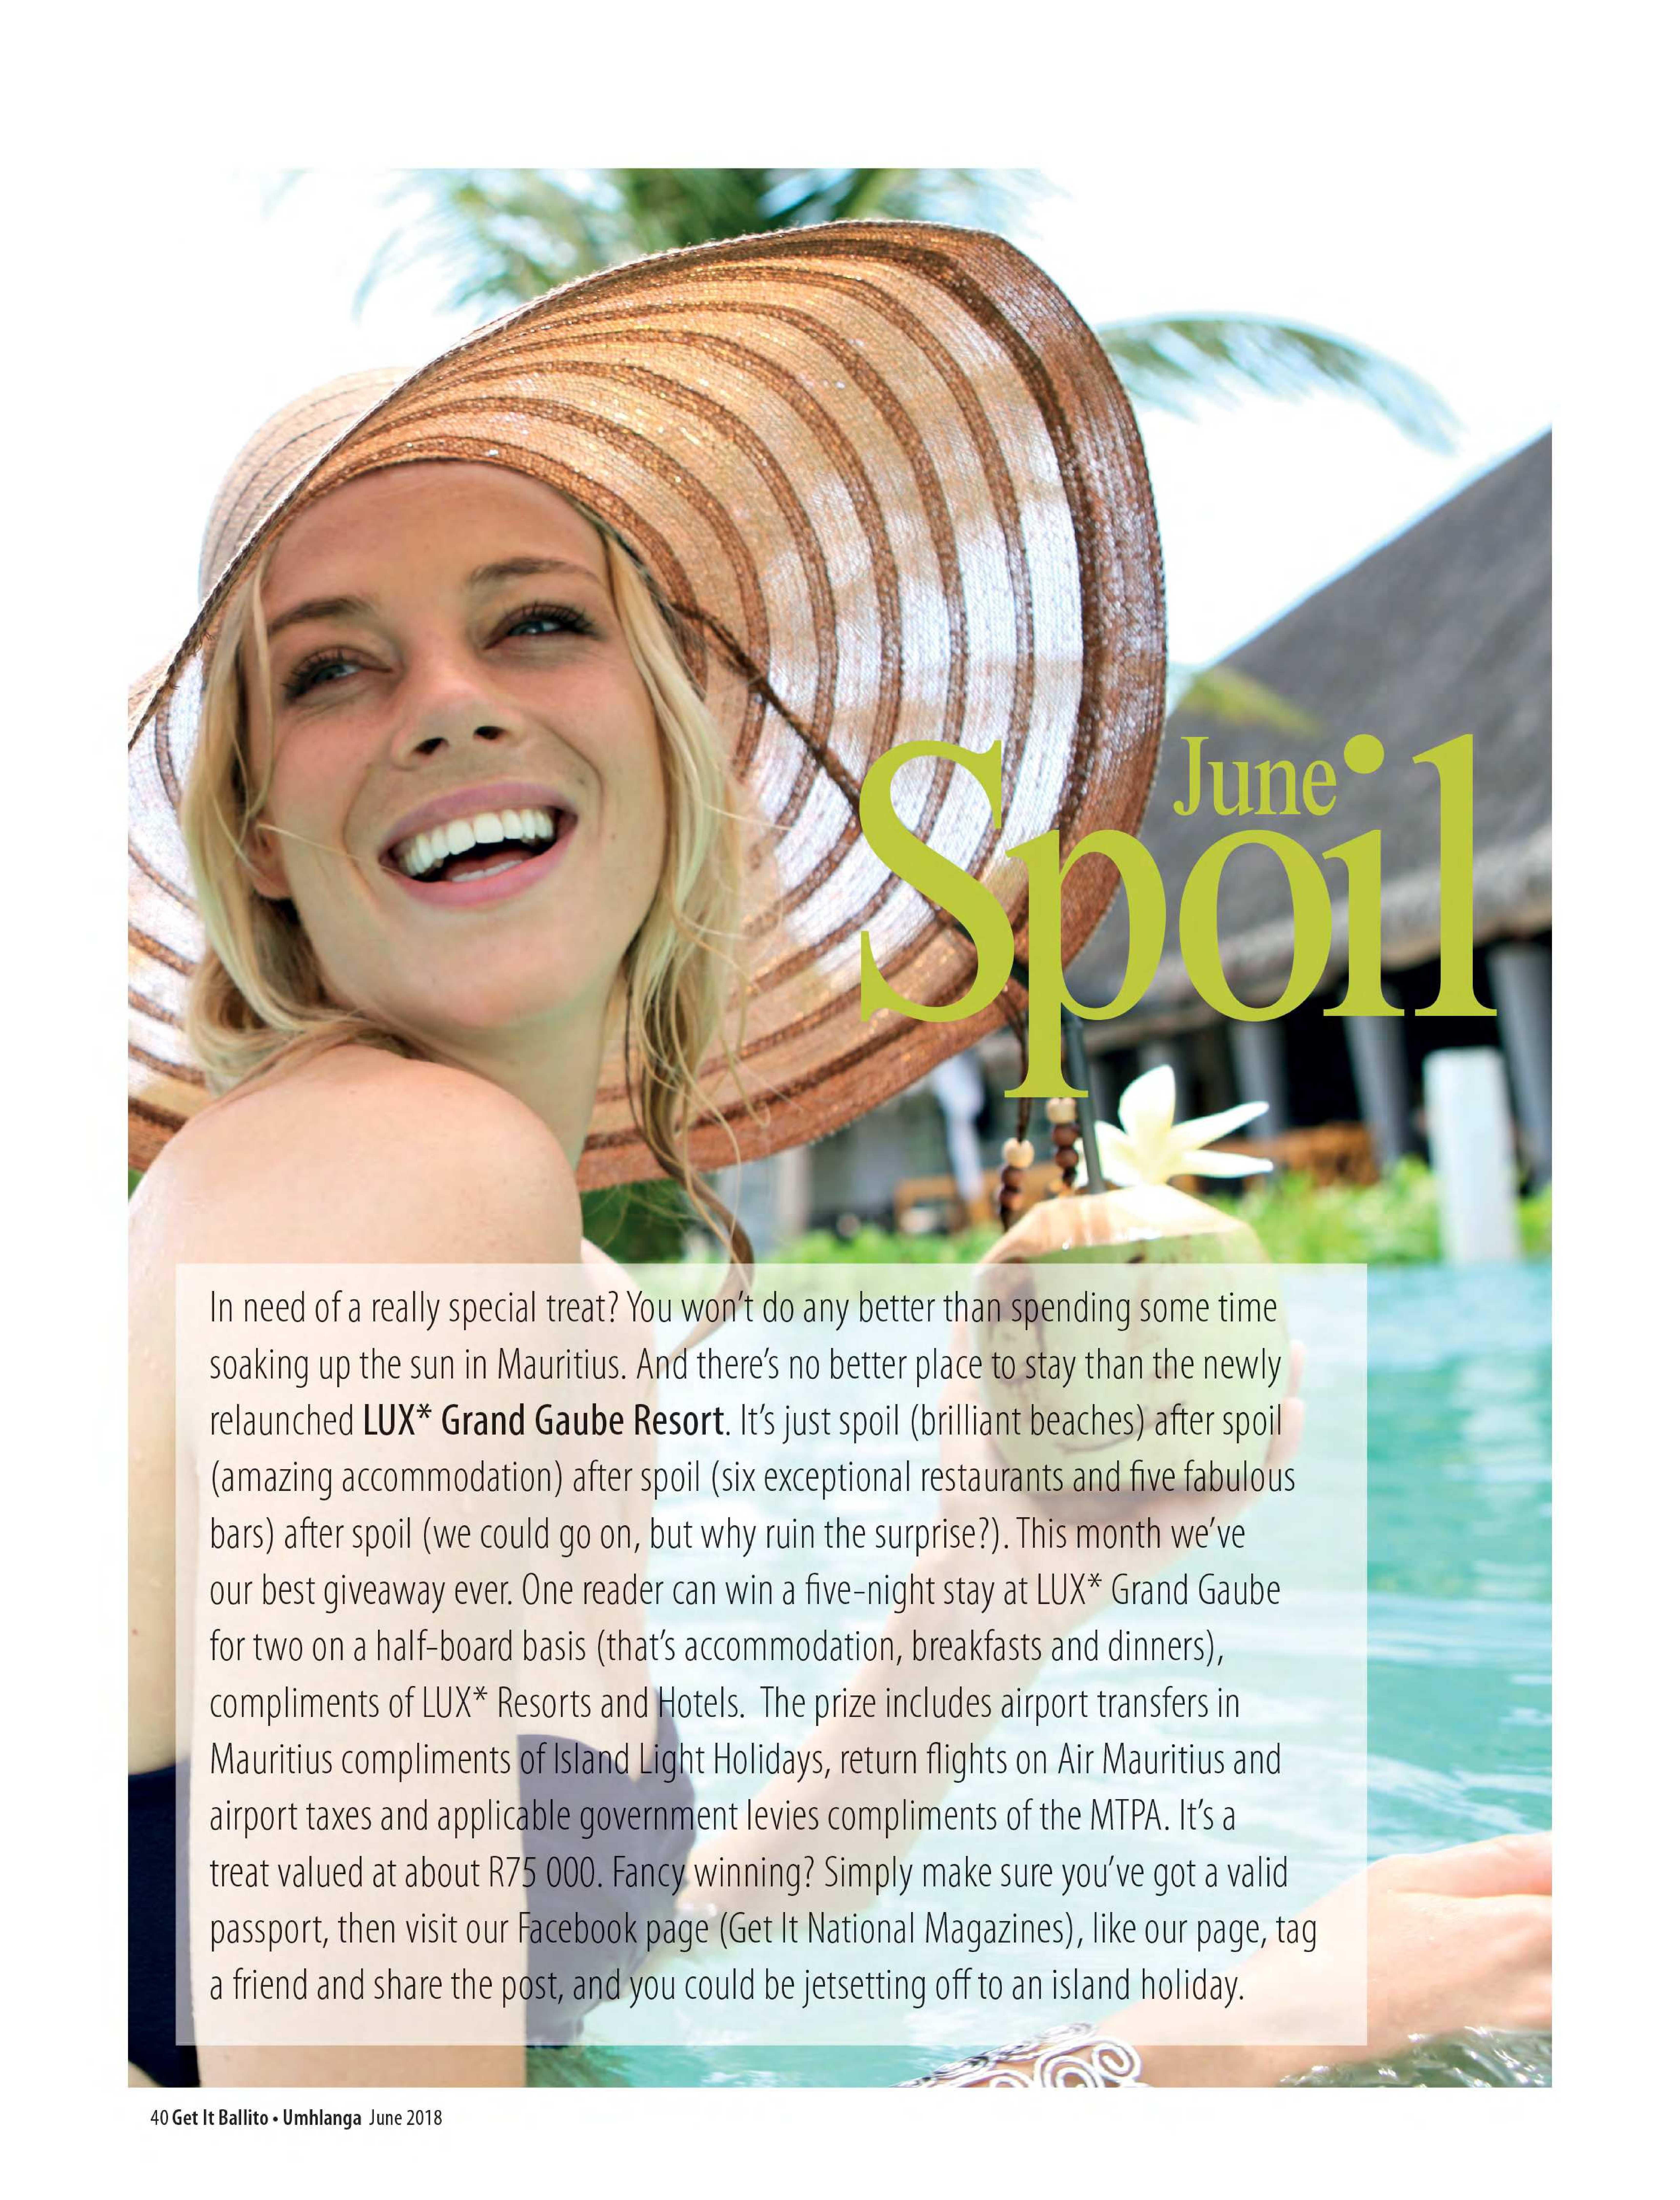 get-magazine-ballitoumhlanga-june-2018-epapers-page-42